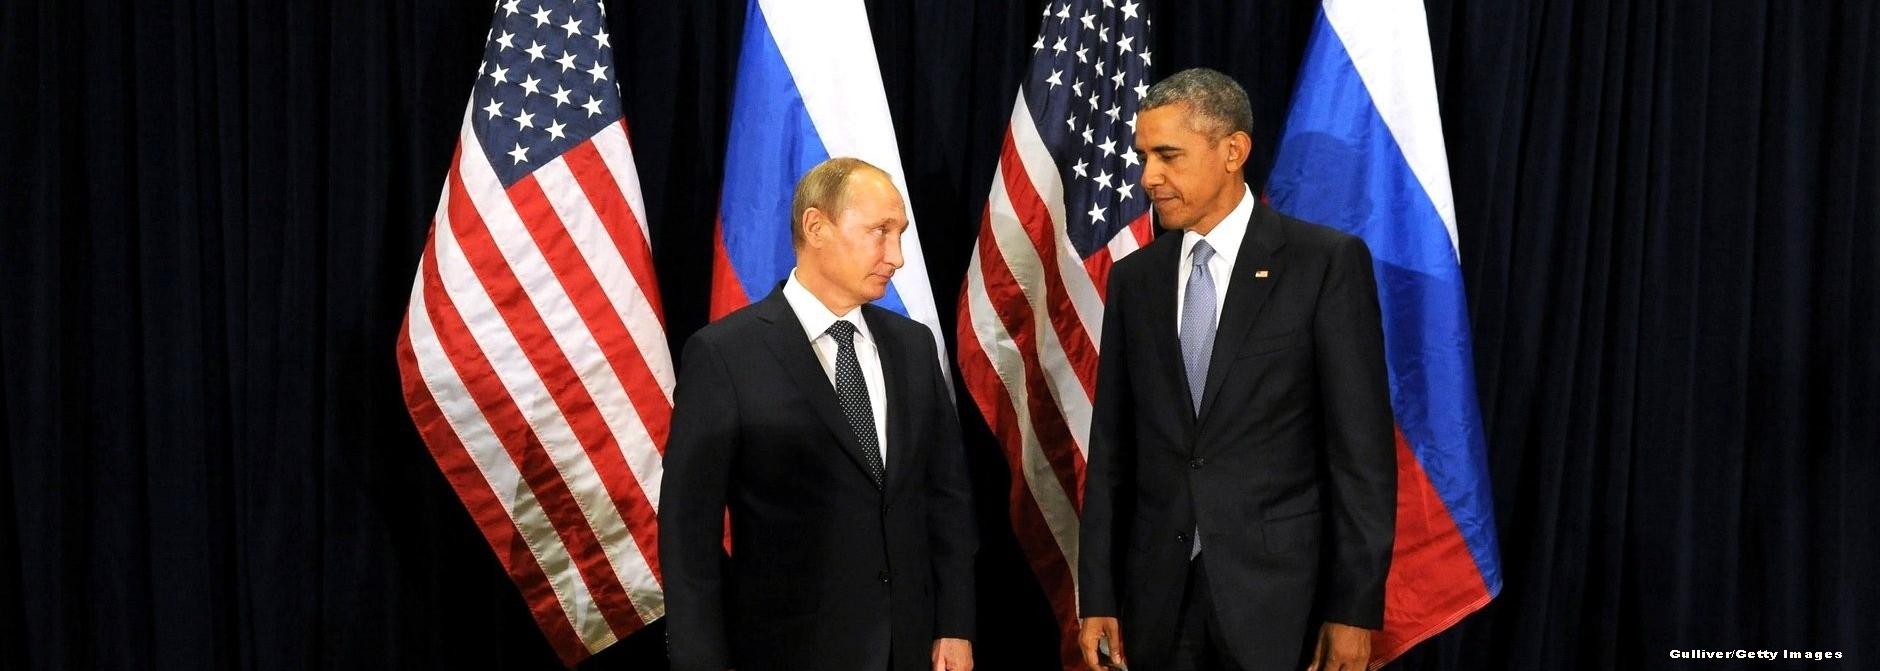 AFP: La televiziunea rusa, al Treilea Razboi Mondial a inceput. Discutii despre adaposturi antinucleare si avioane doborate